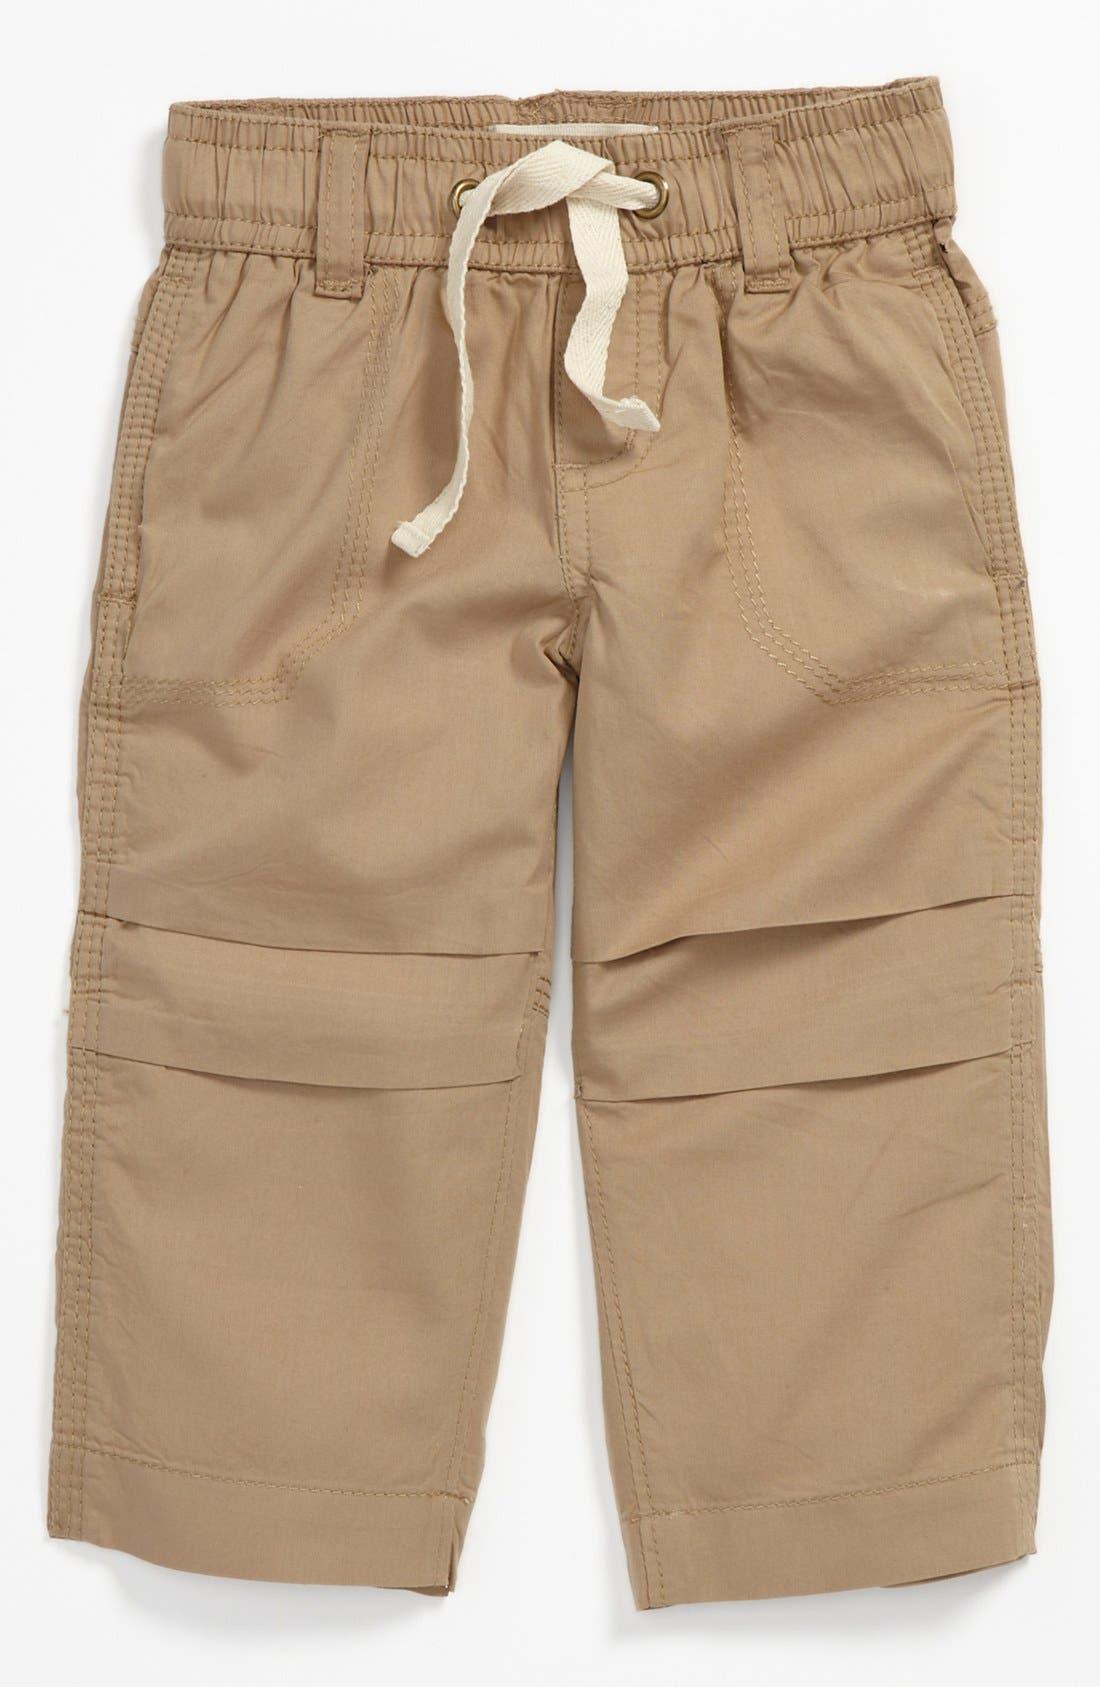 Main Image - Peek 'Everyday' Pants (Baby)